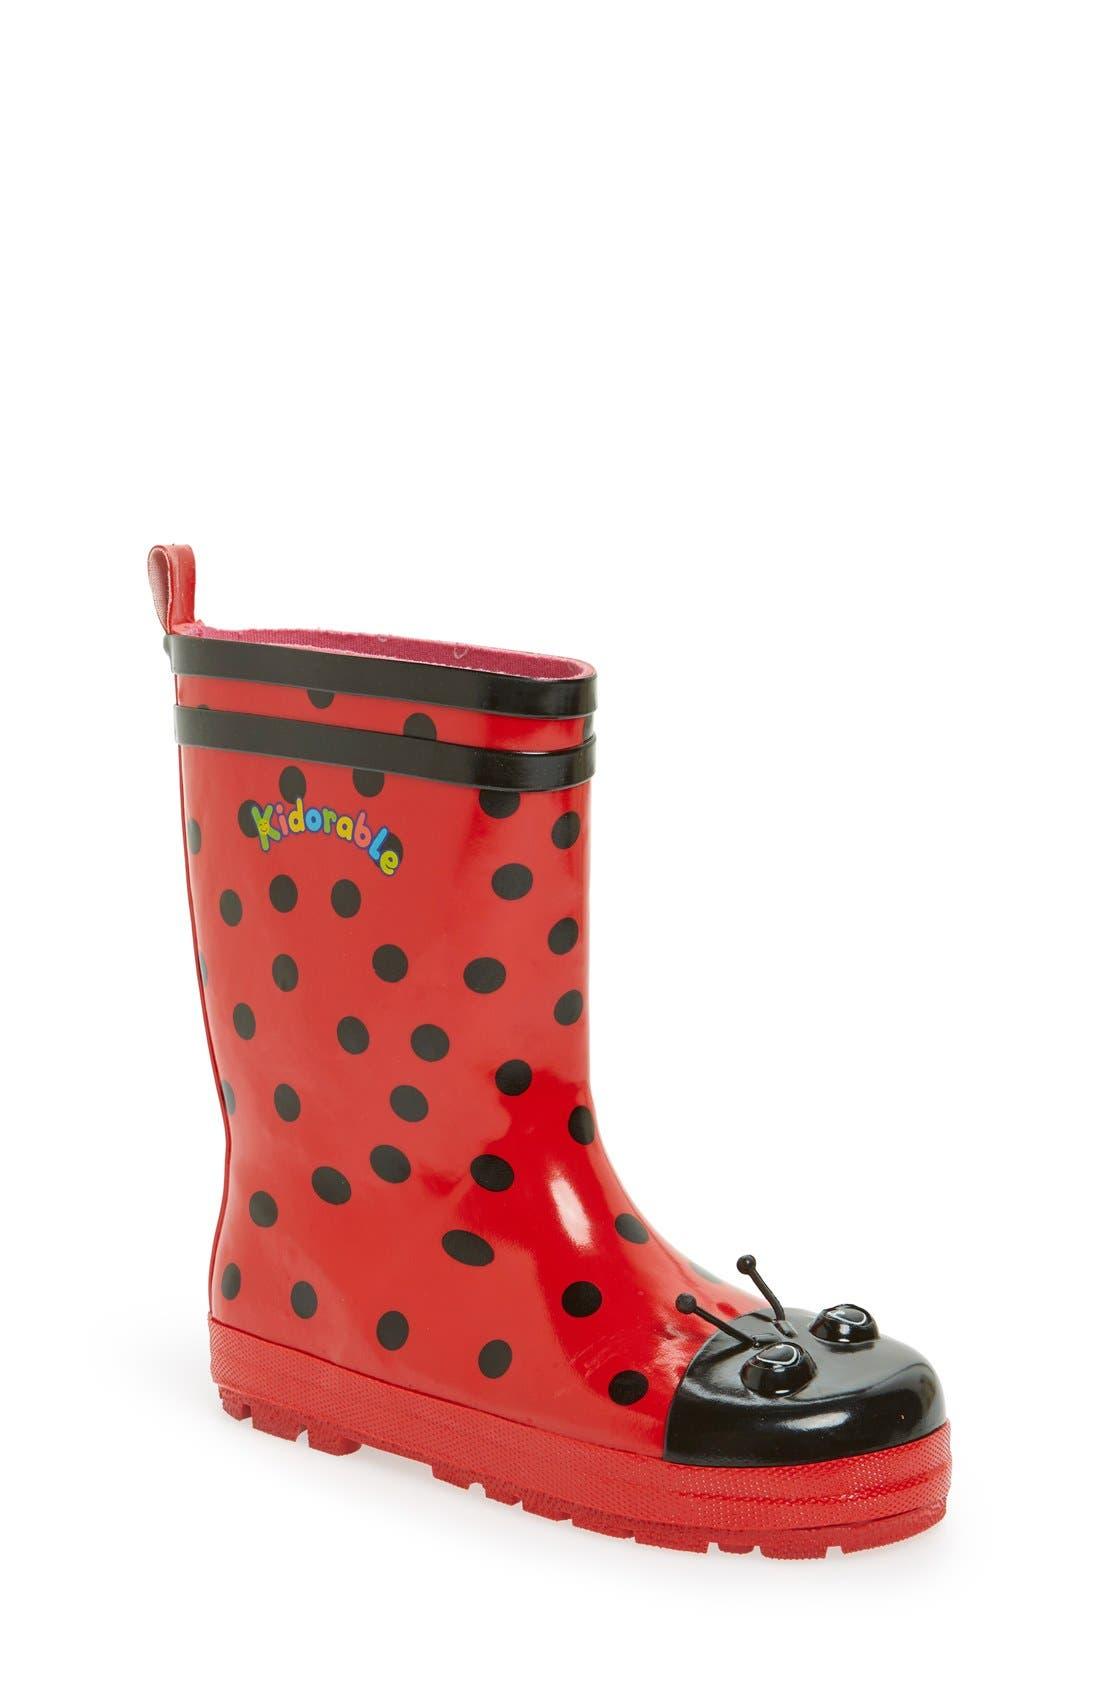 'Ladybug' Waterproof Rain Boot,                             Main thumbnail 1, color,                             Red